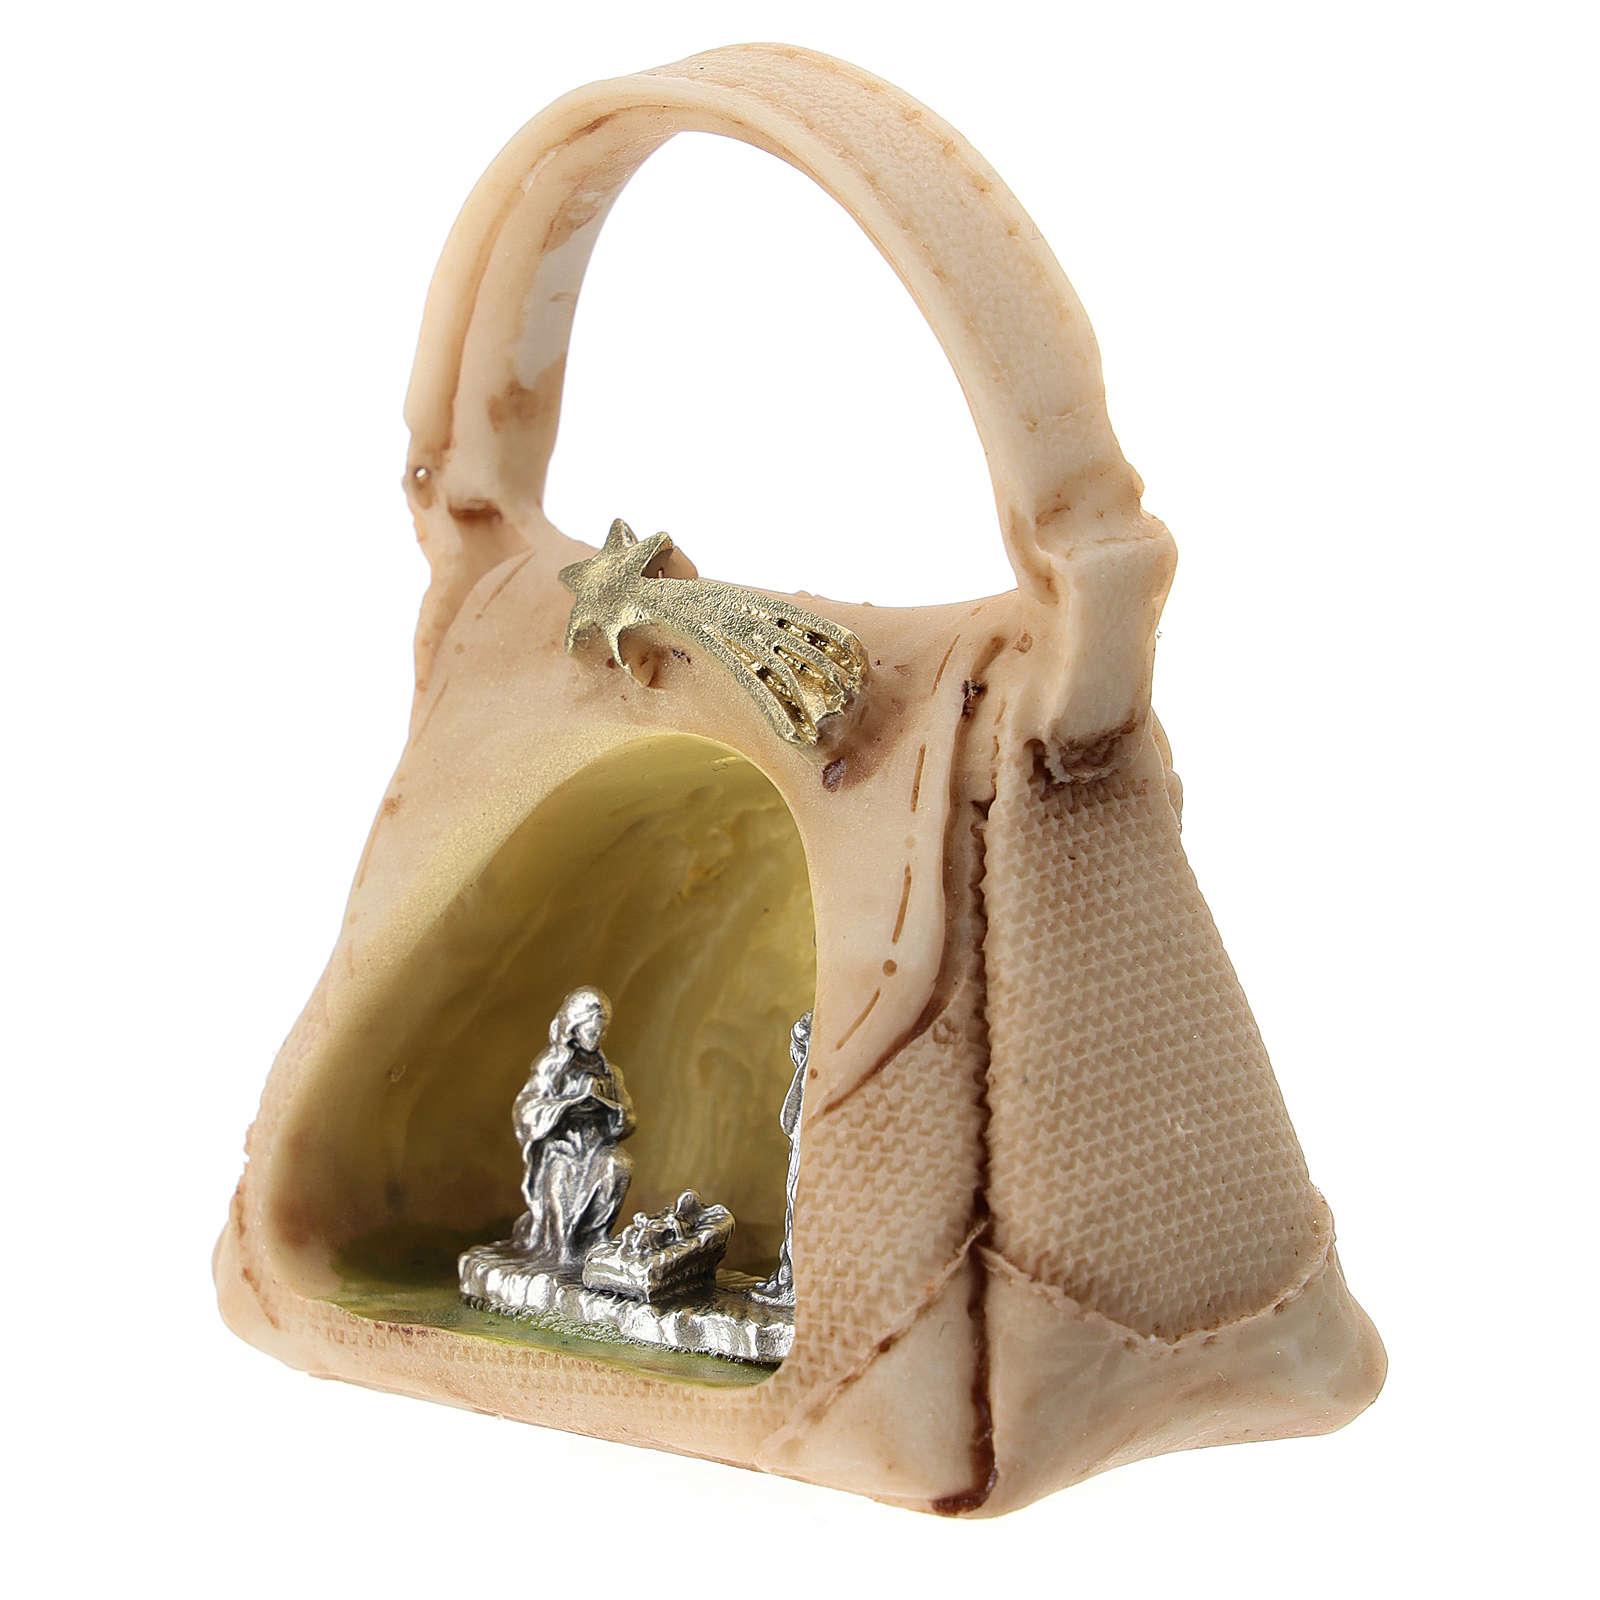 Sagrada Familia de metal en una bolsa 5 cm 3